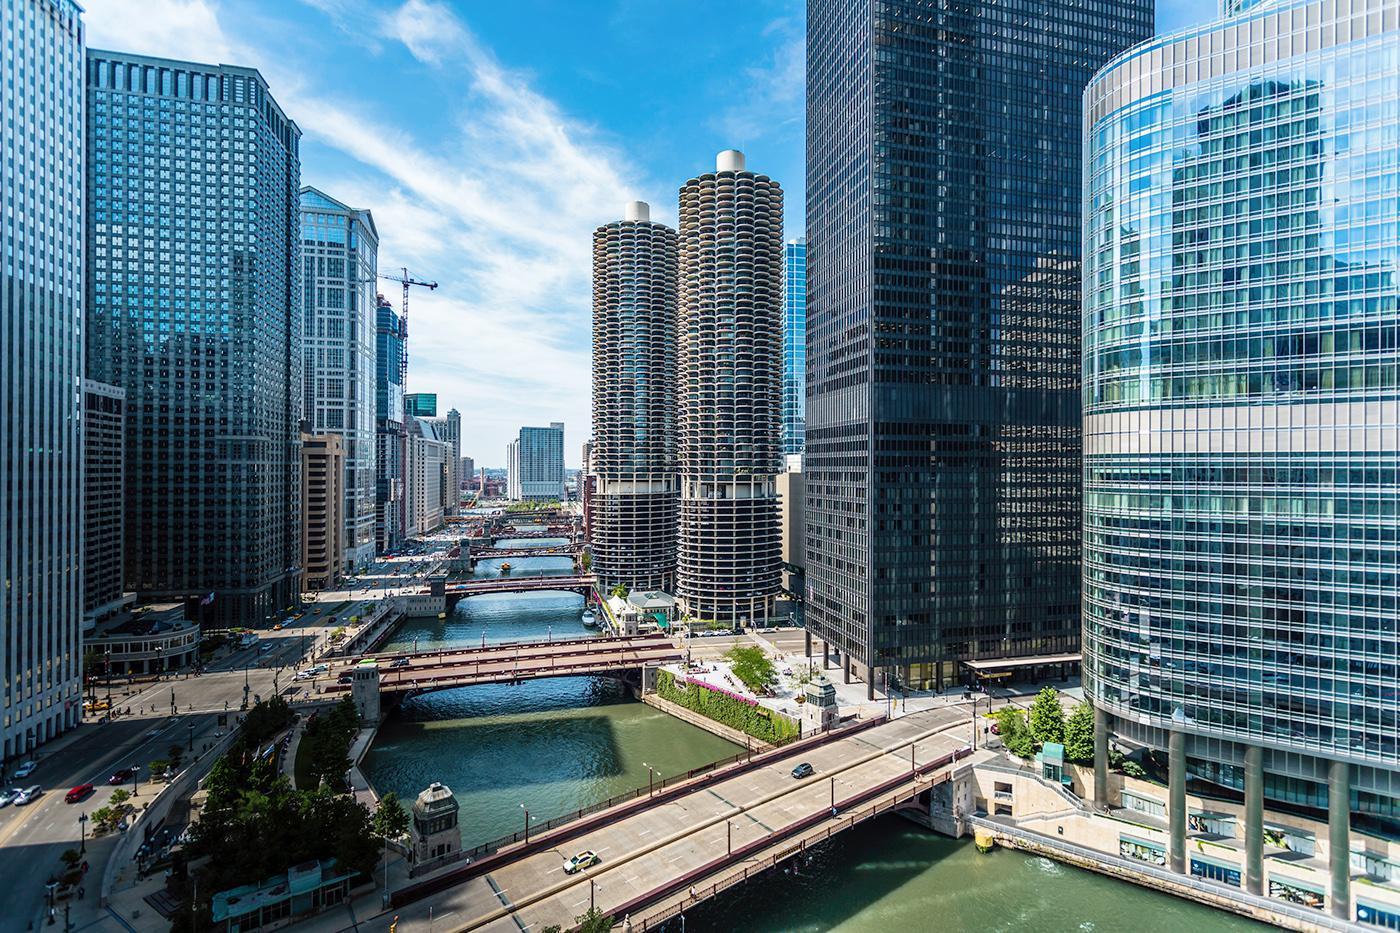 chicago usa - ავიაბილეთები ჩიკაგო